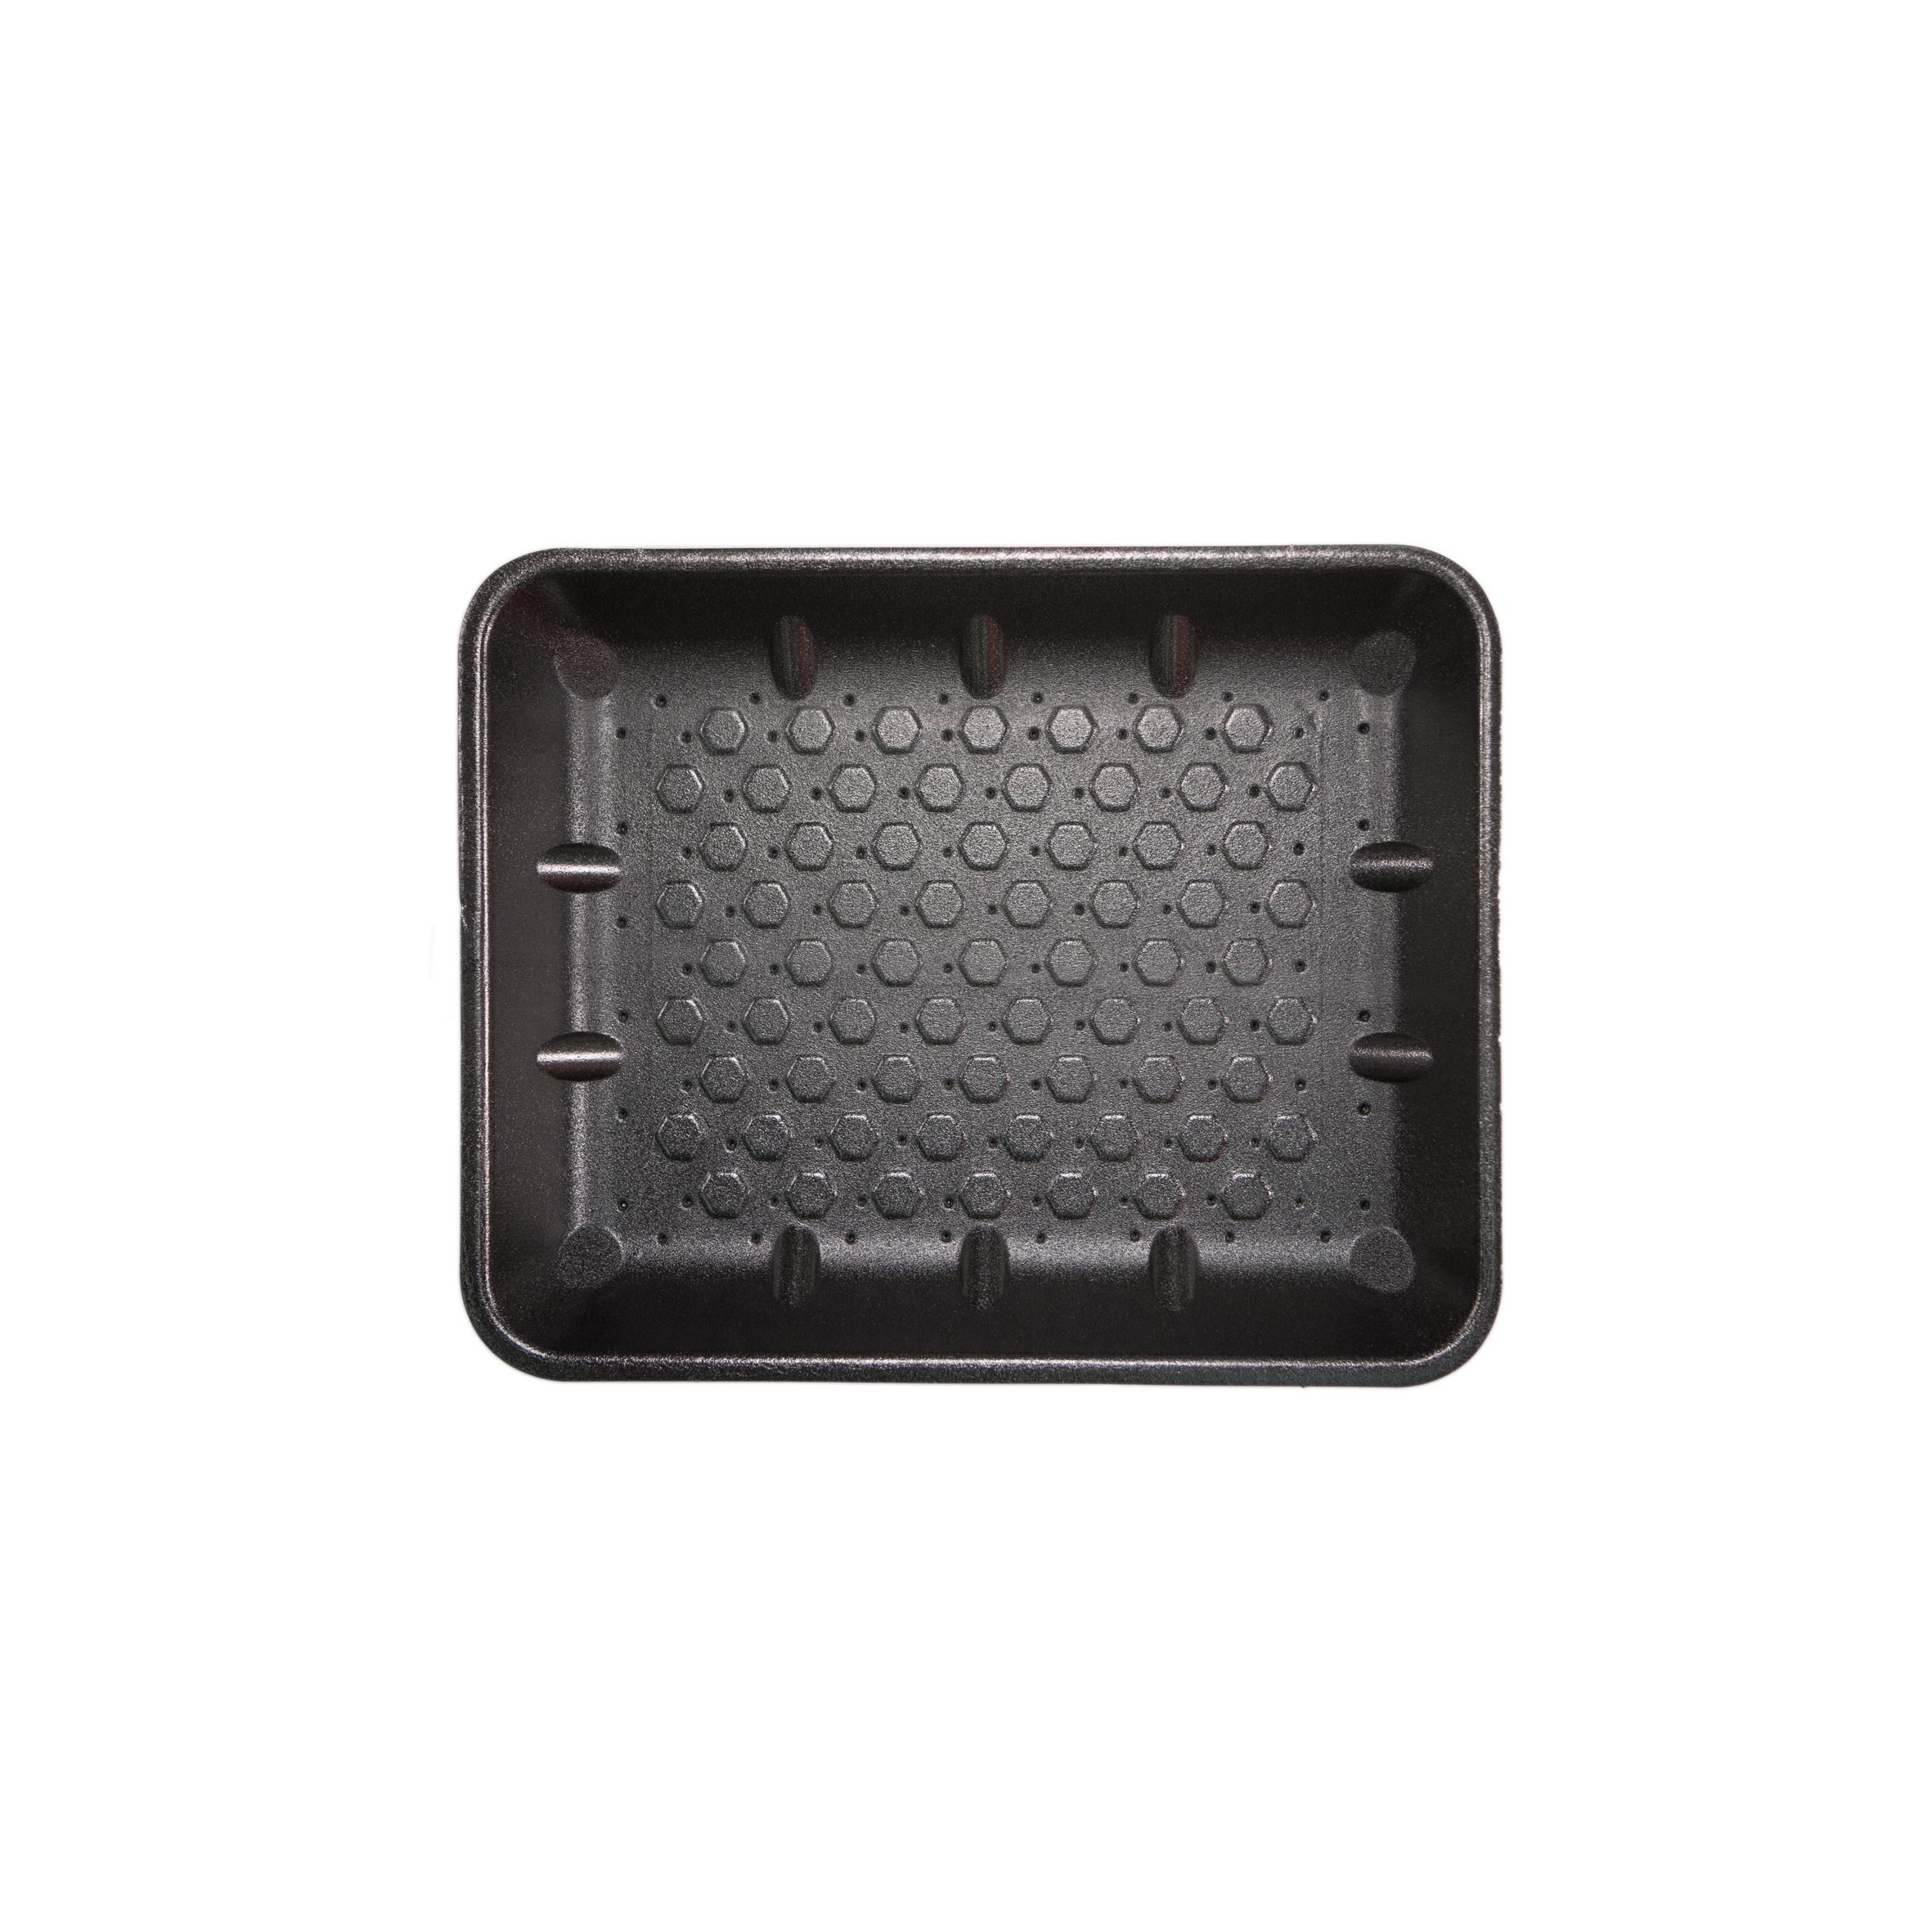 iK0109      OPEN CELL 35mm 11x9    90 per sleeve 360 per carton